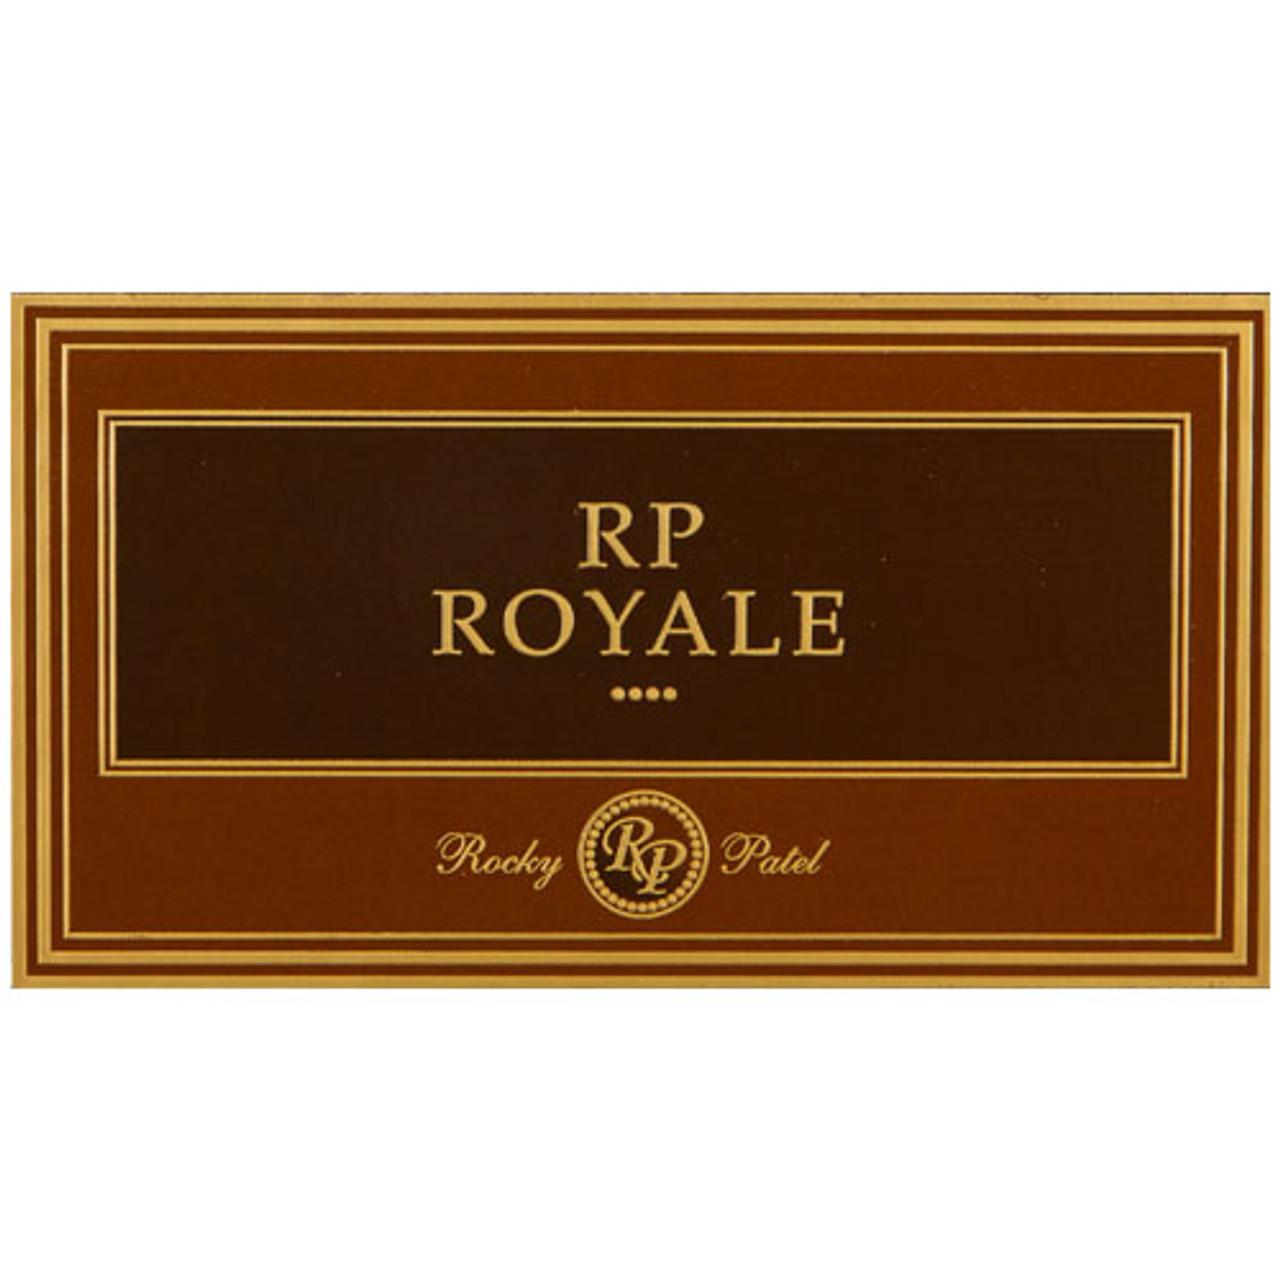 Rocky Patel Royale Colossal Cigars - 7 x 62 (Box of 20)